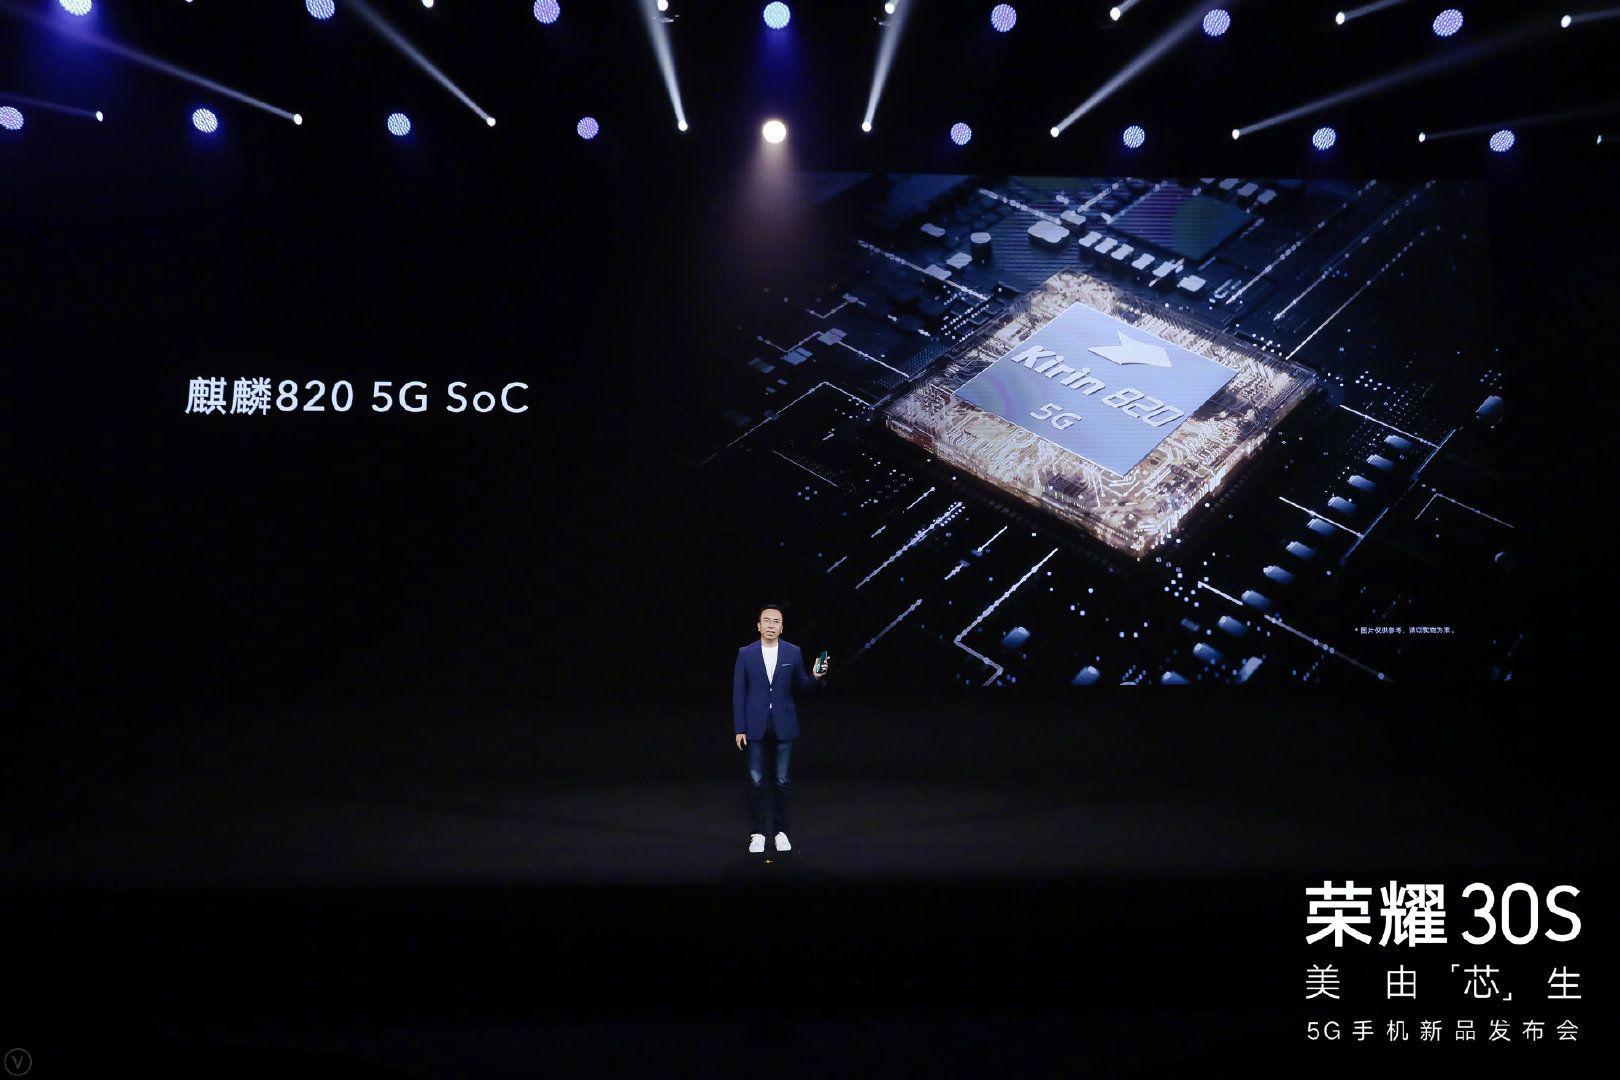 Huawei Kirin 820 5Gを発表、HiSilicon初のミドルレンジ帯5G通信対応プロセッサー